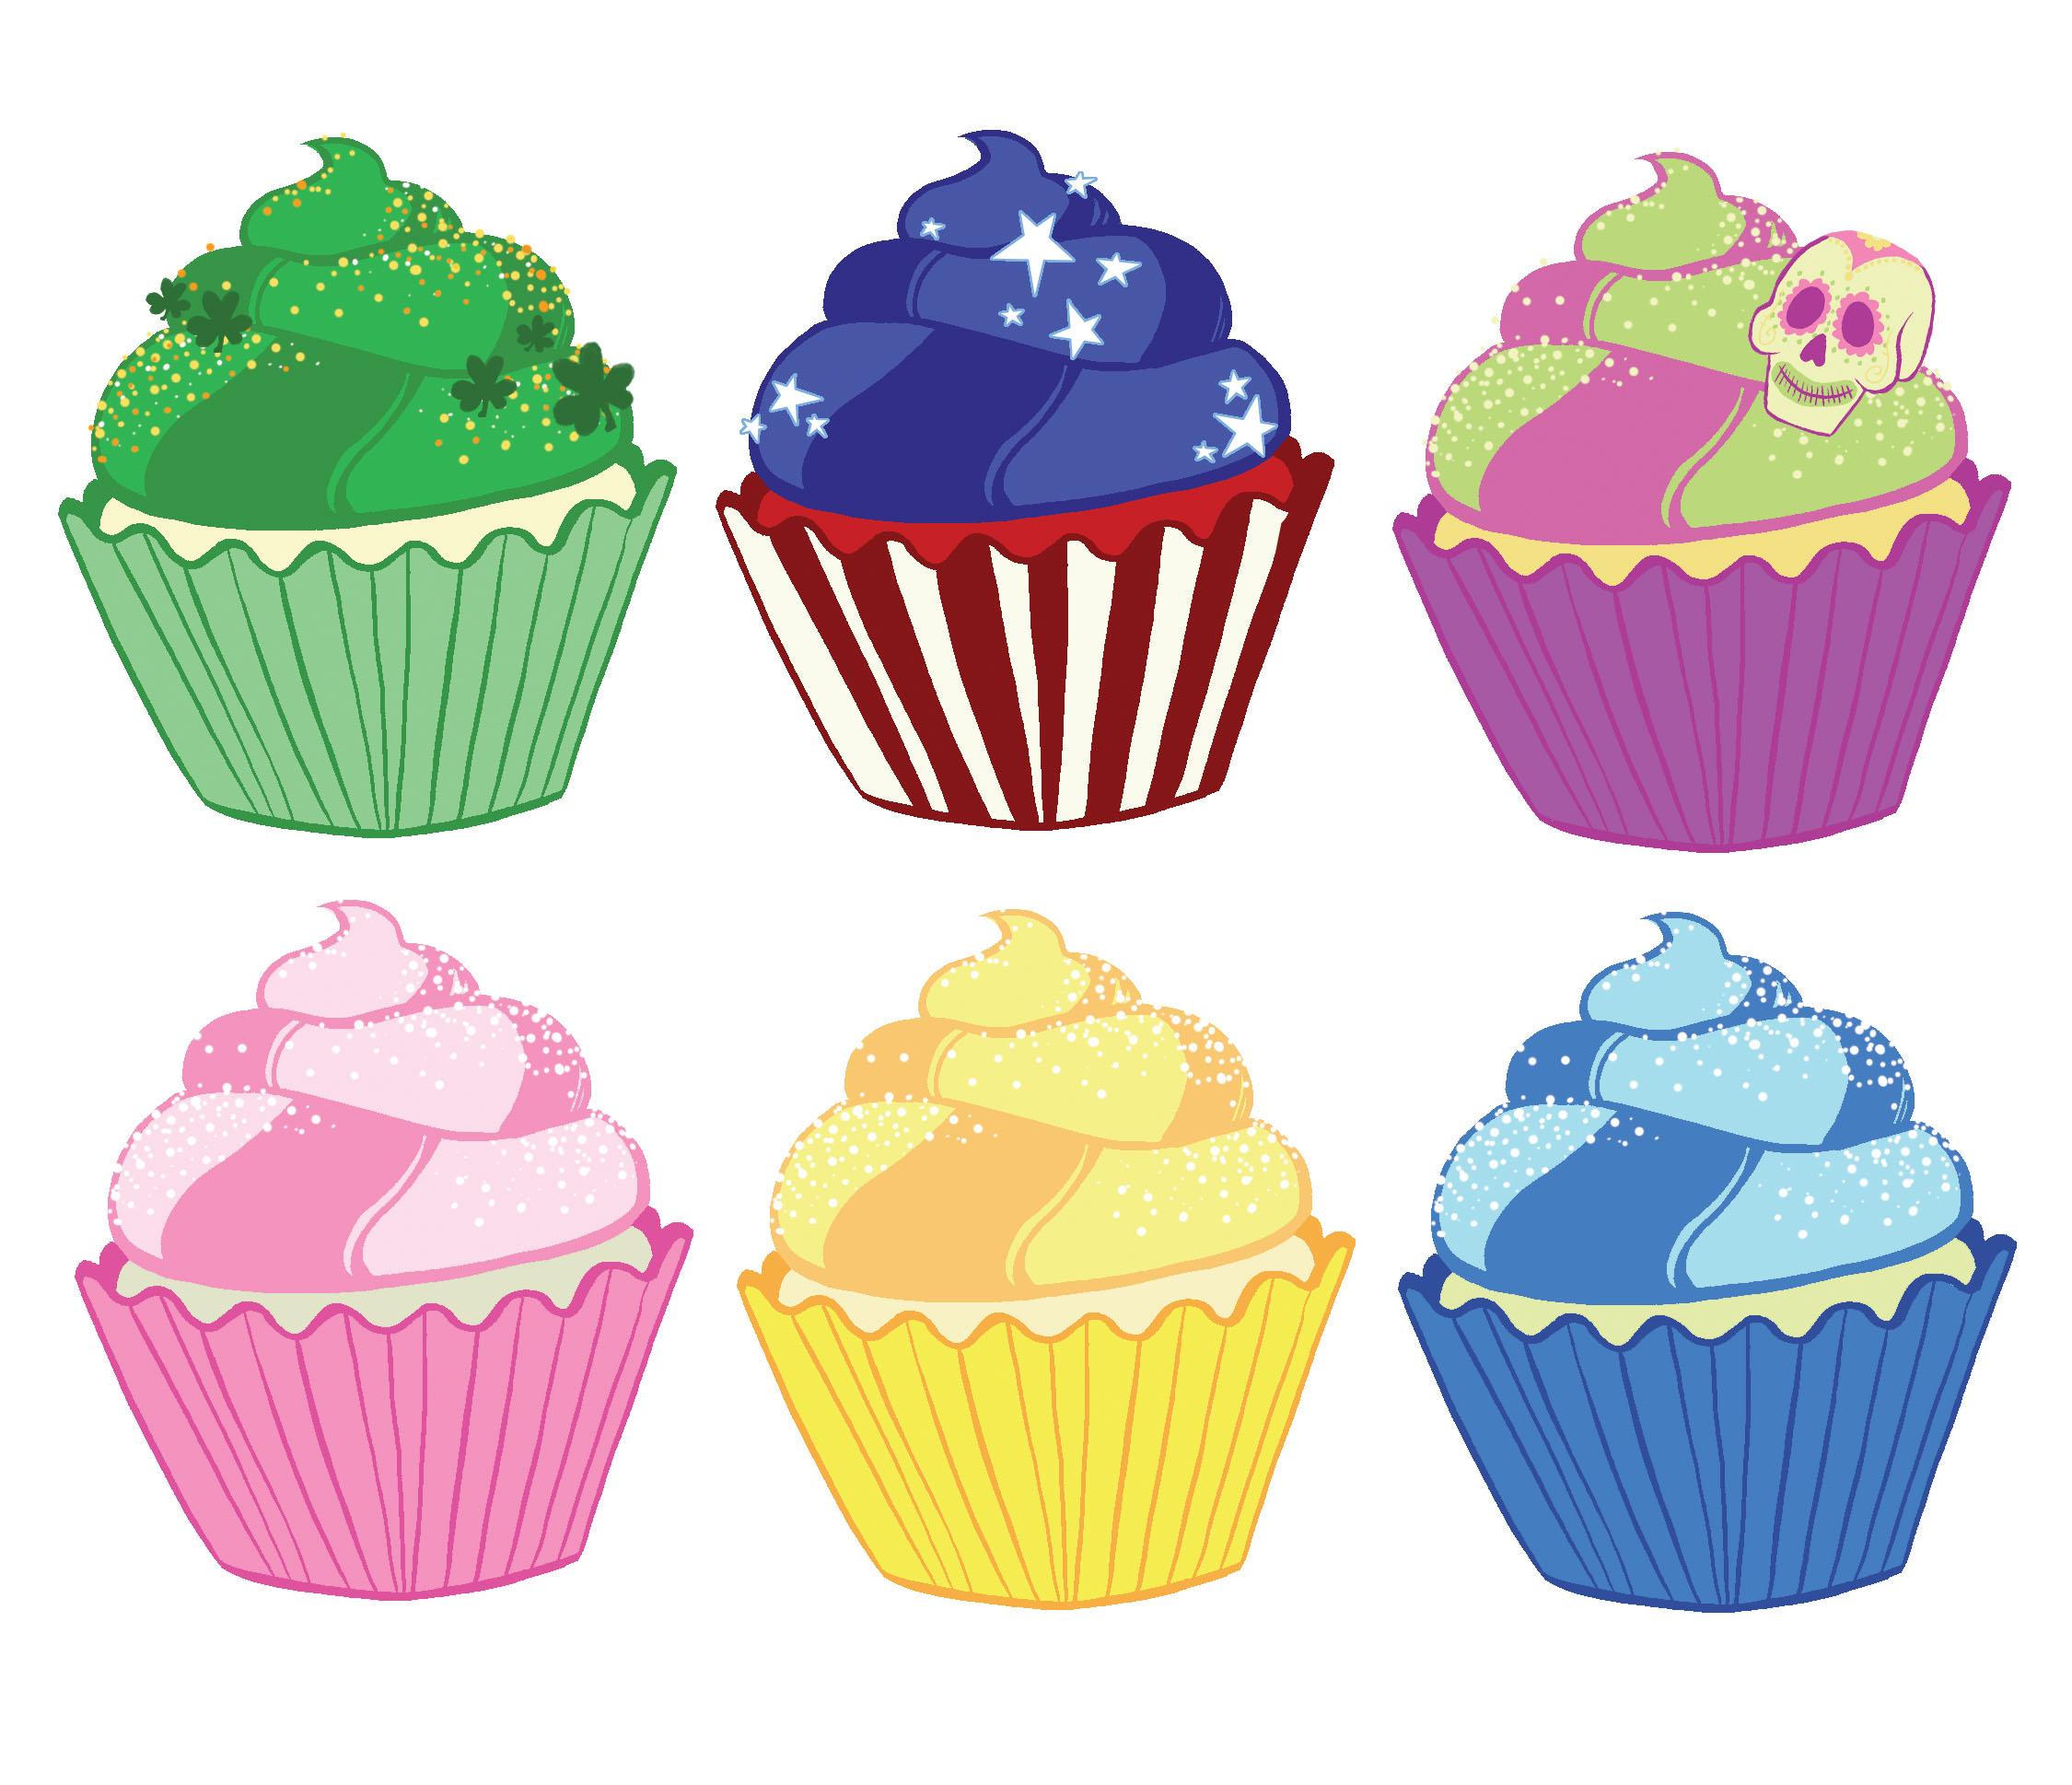 Prop_Cupcakes.jpg